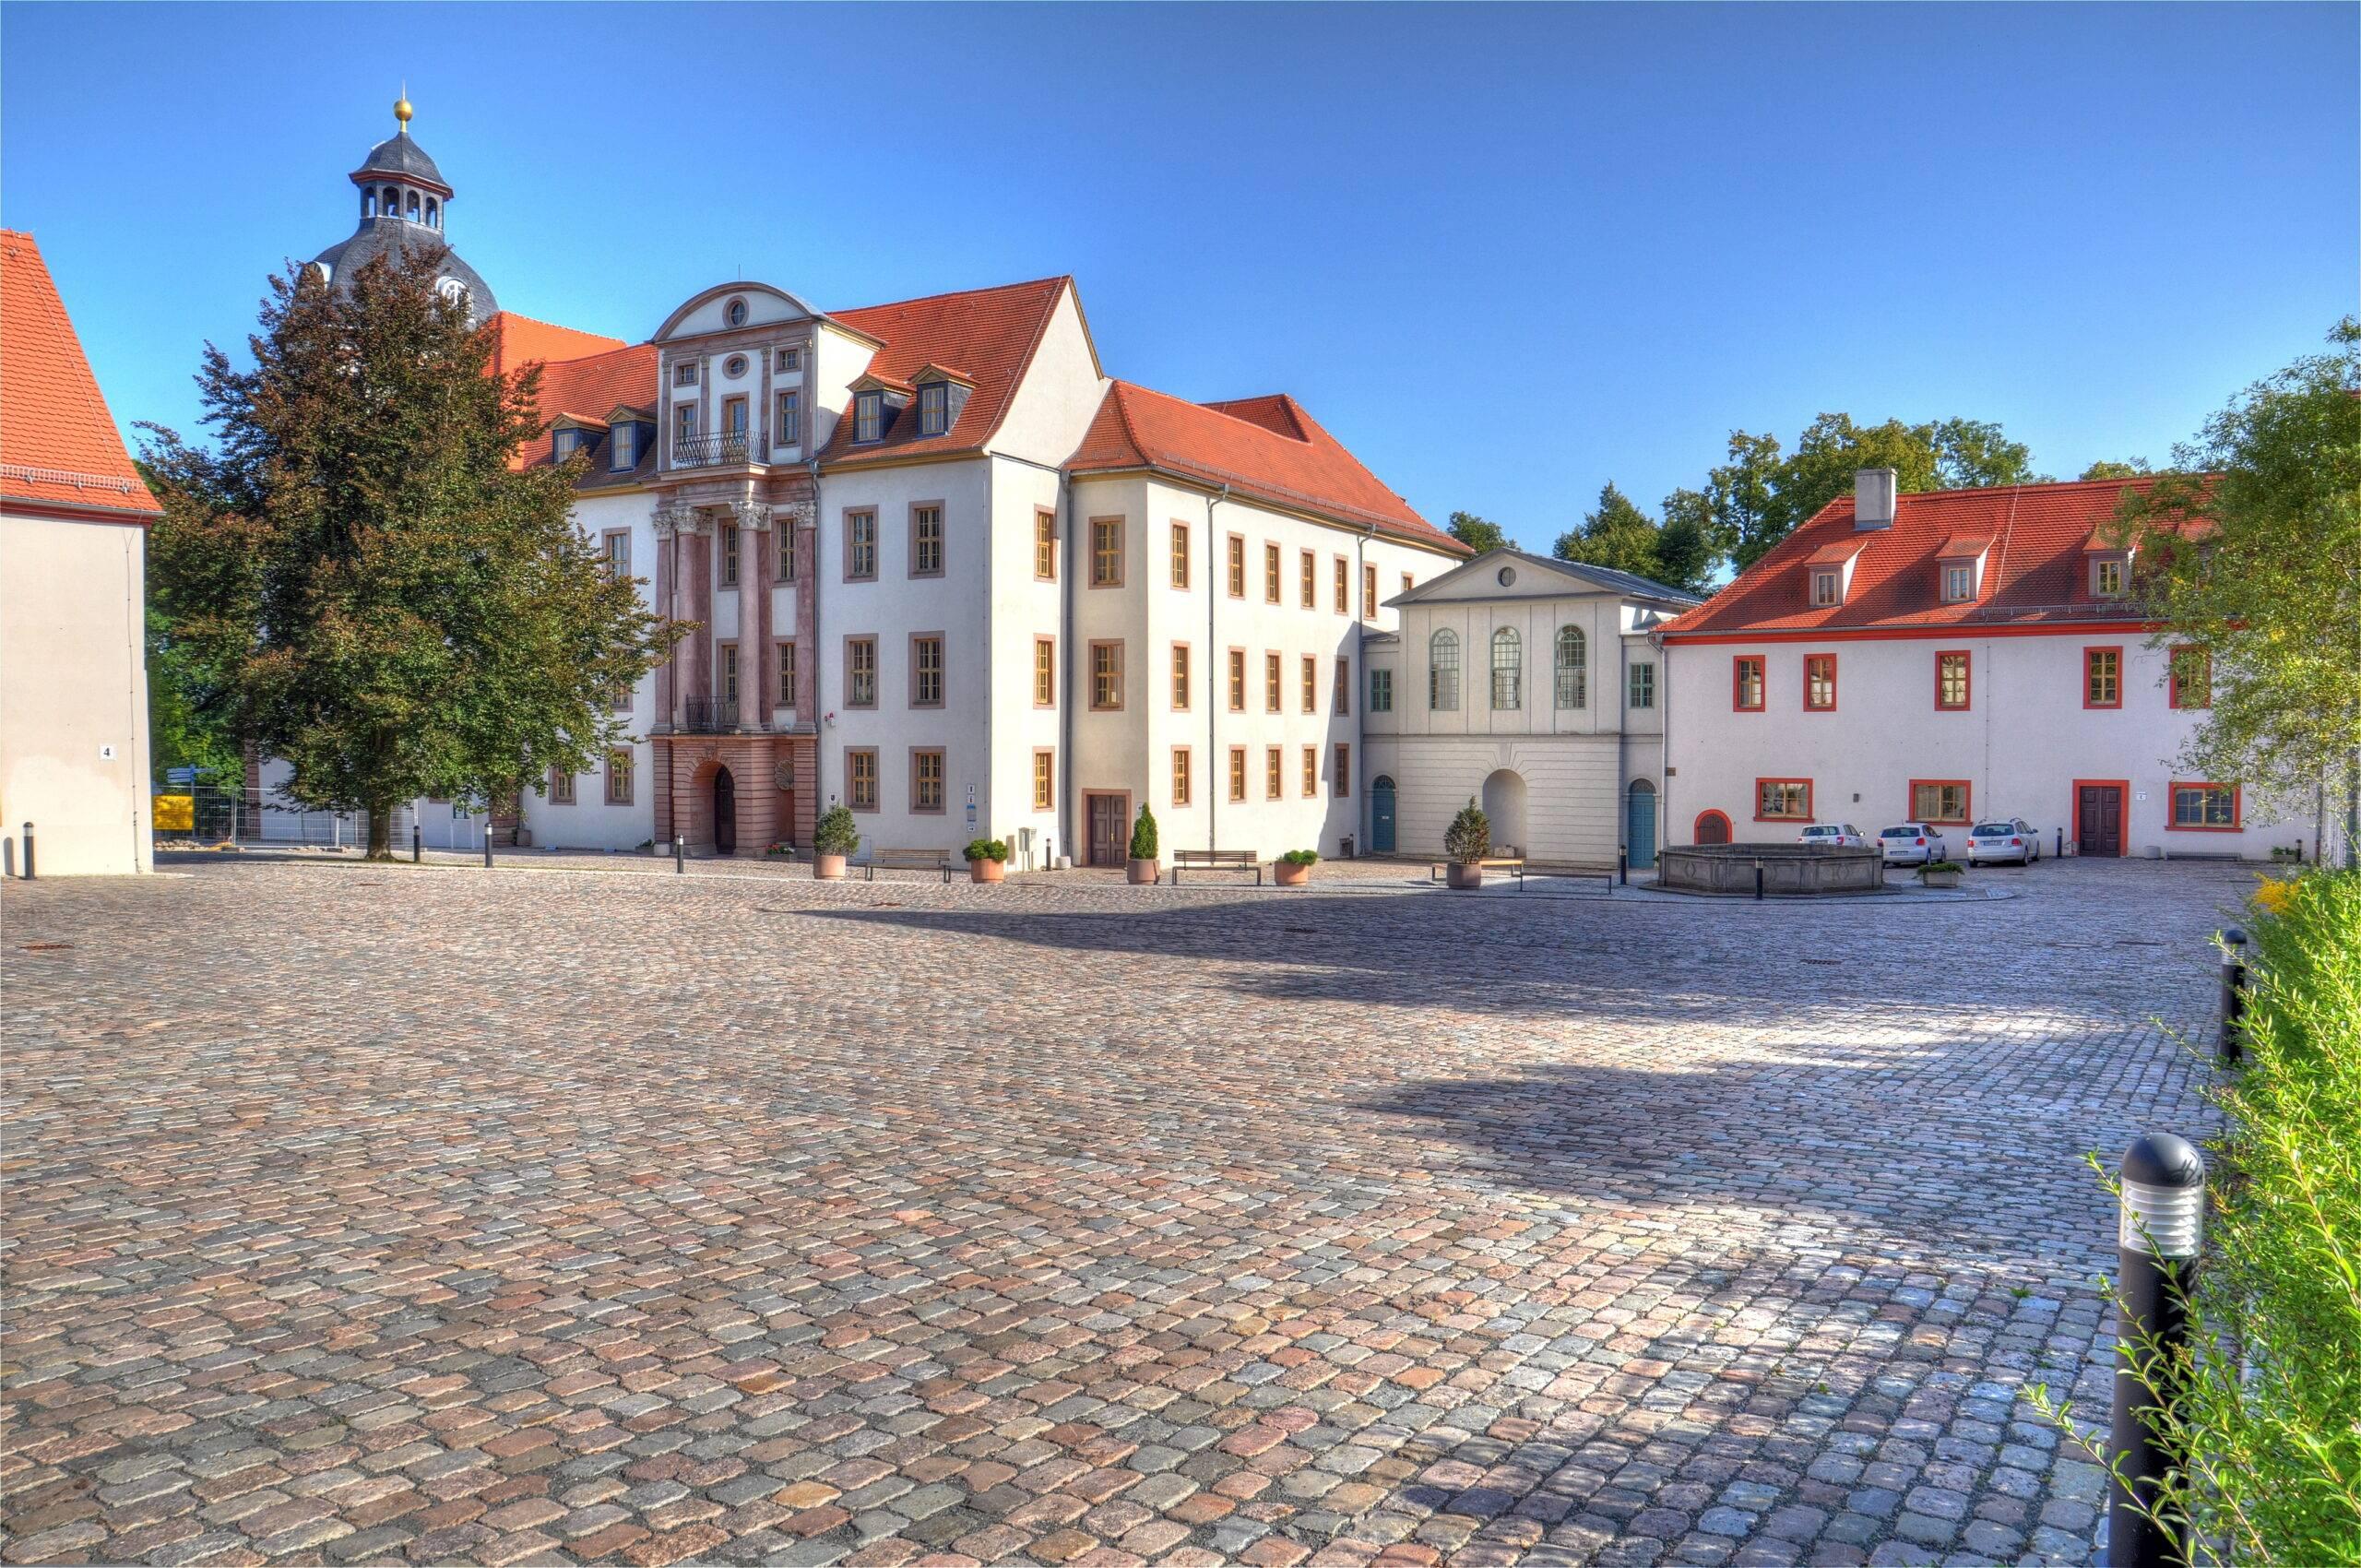 Schloß Eisenberg